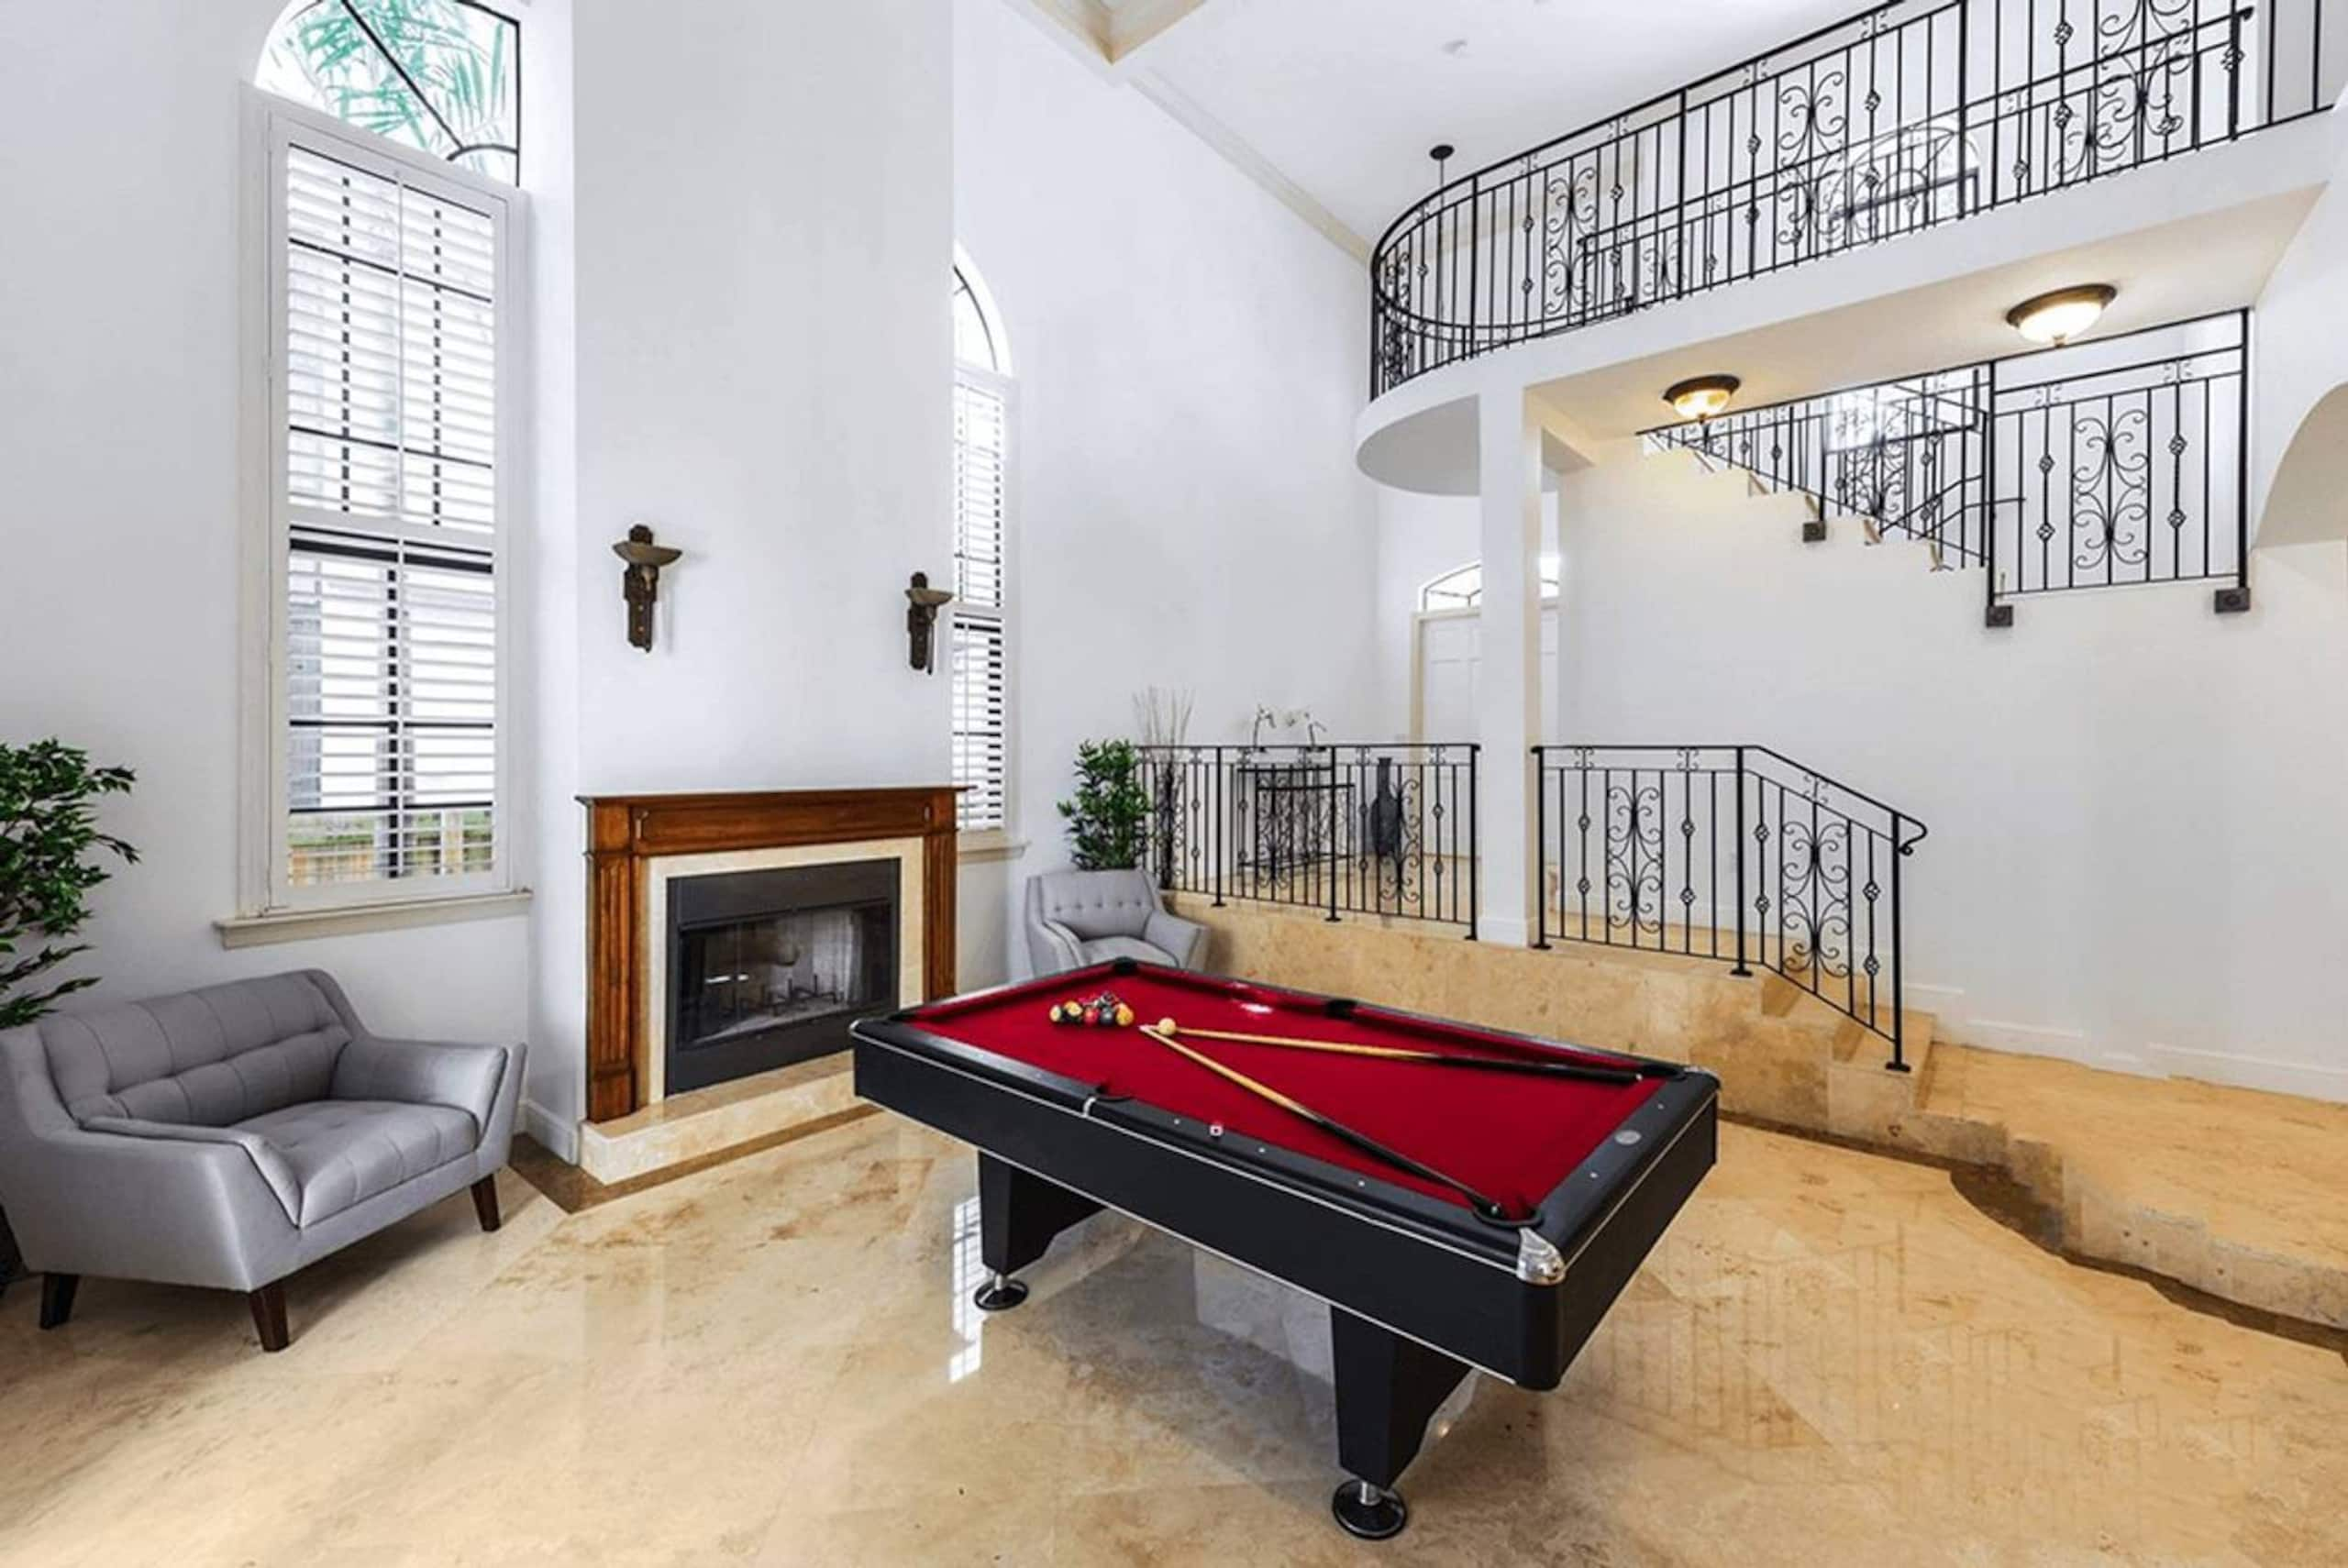 Apartment Villa Lawrence - Luxury Villa photo 22682478